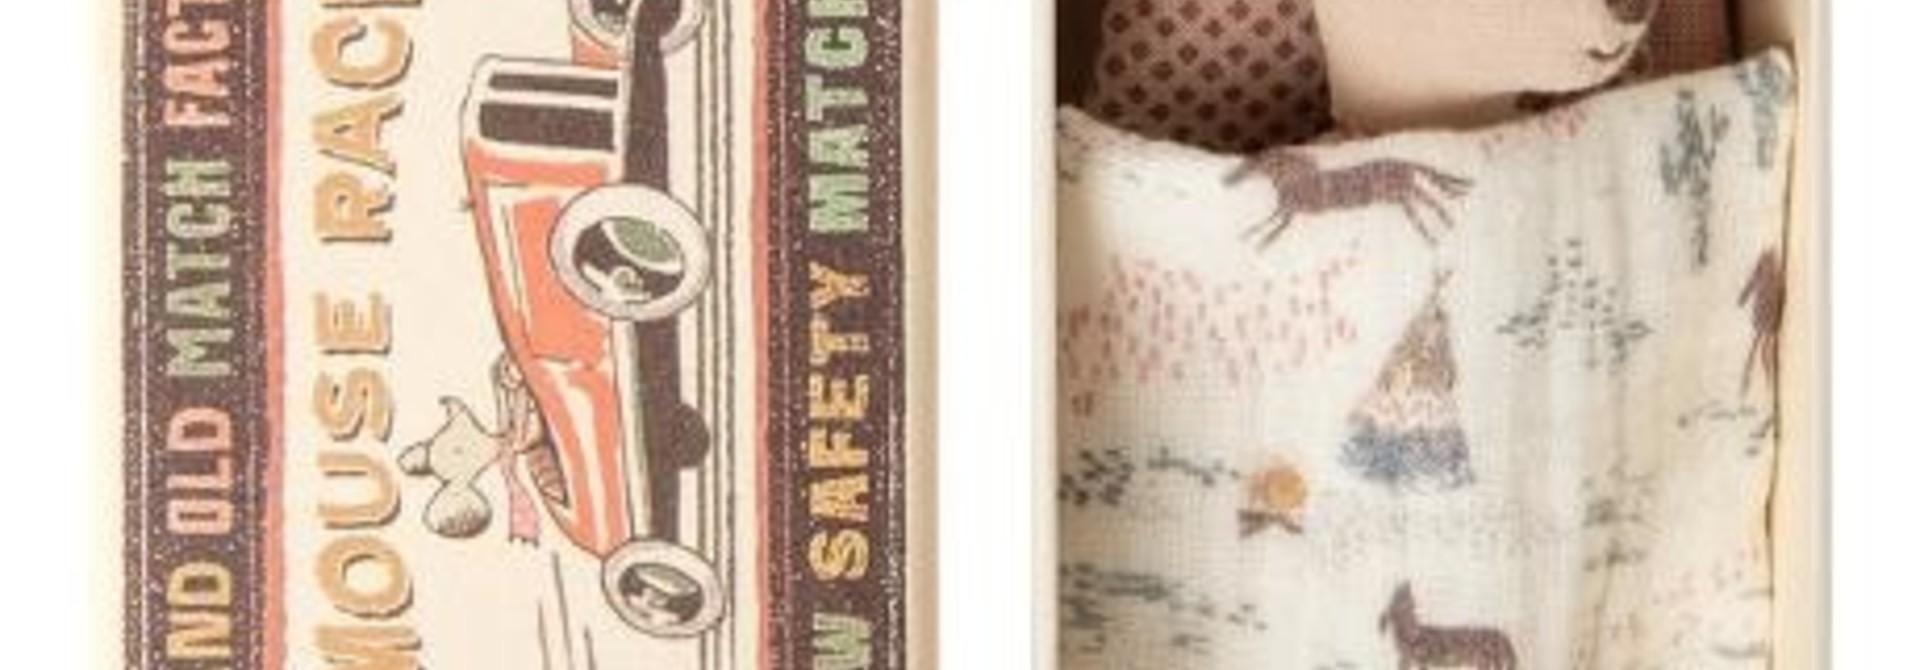 Little Sister Mouse - Matchbox - Quilt